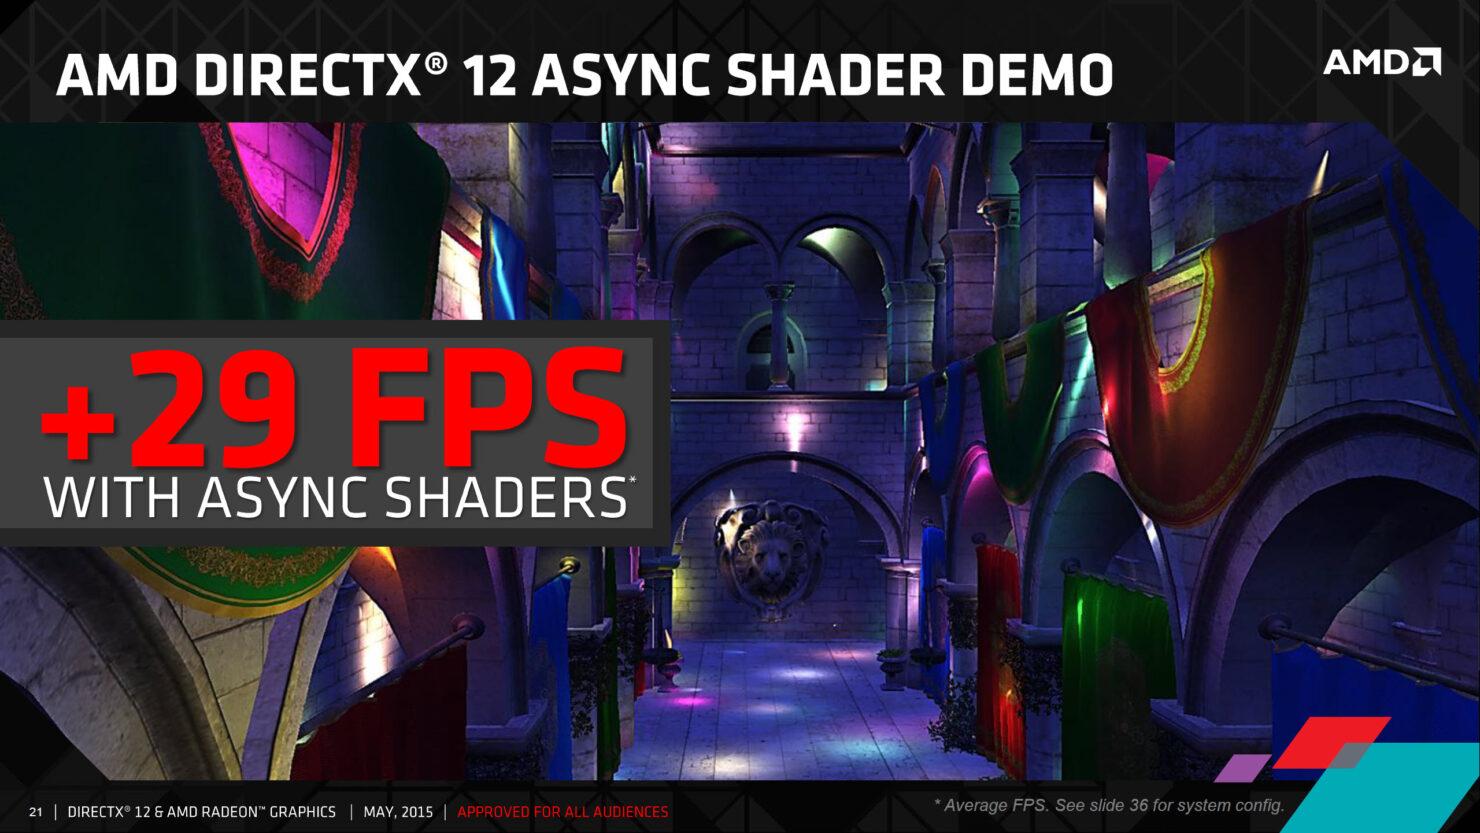 amd_directx-12_async-shaders-performance